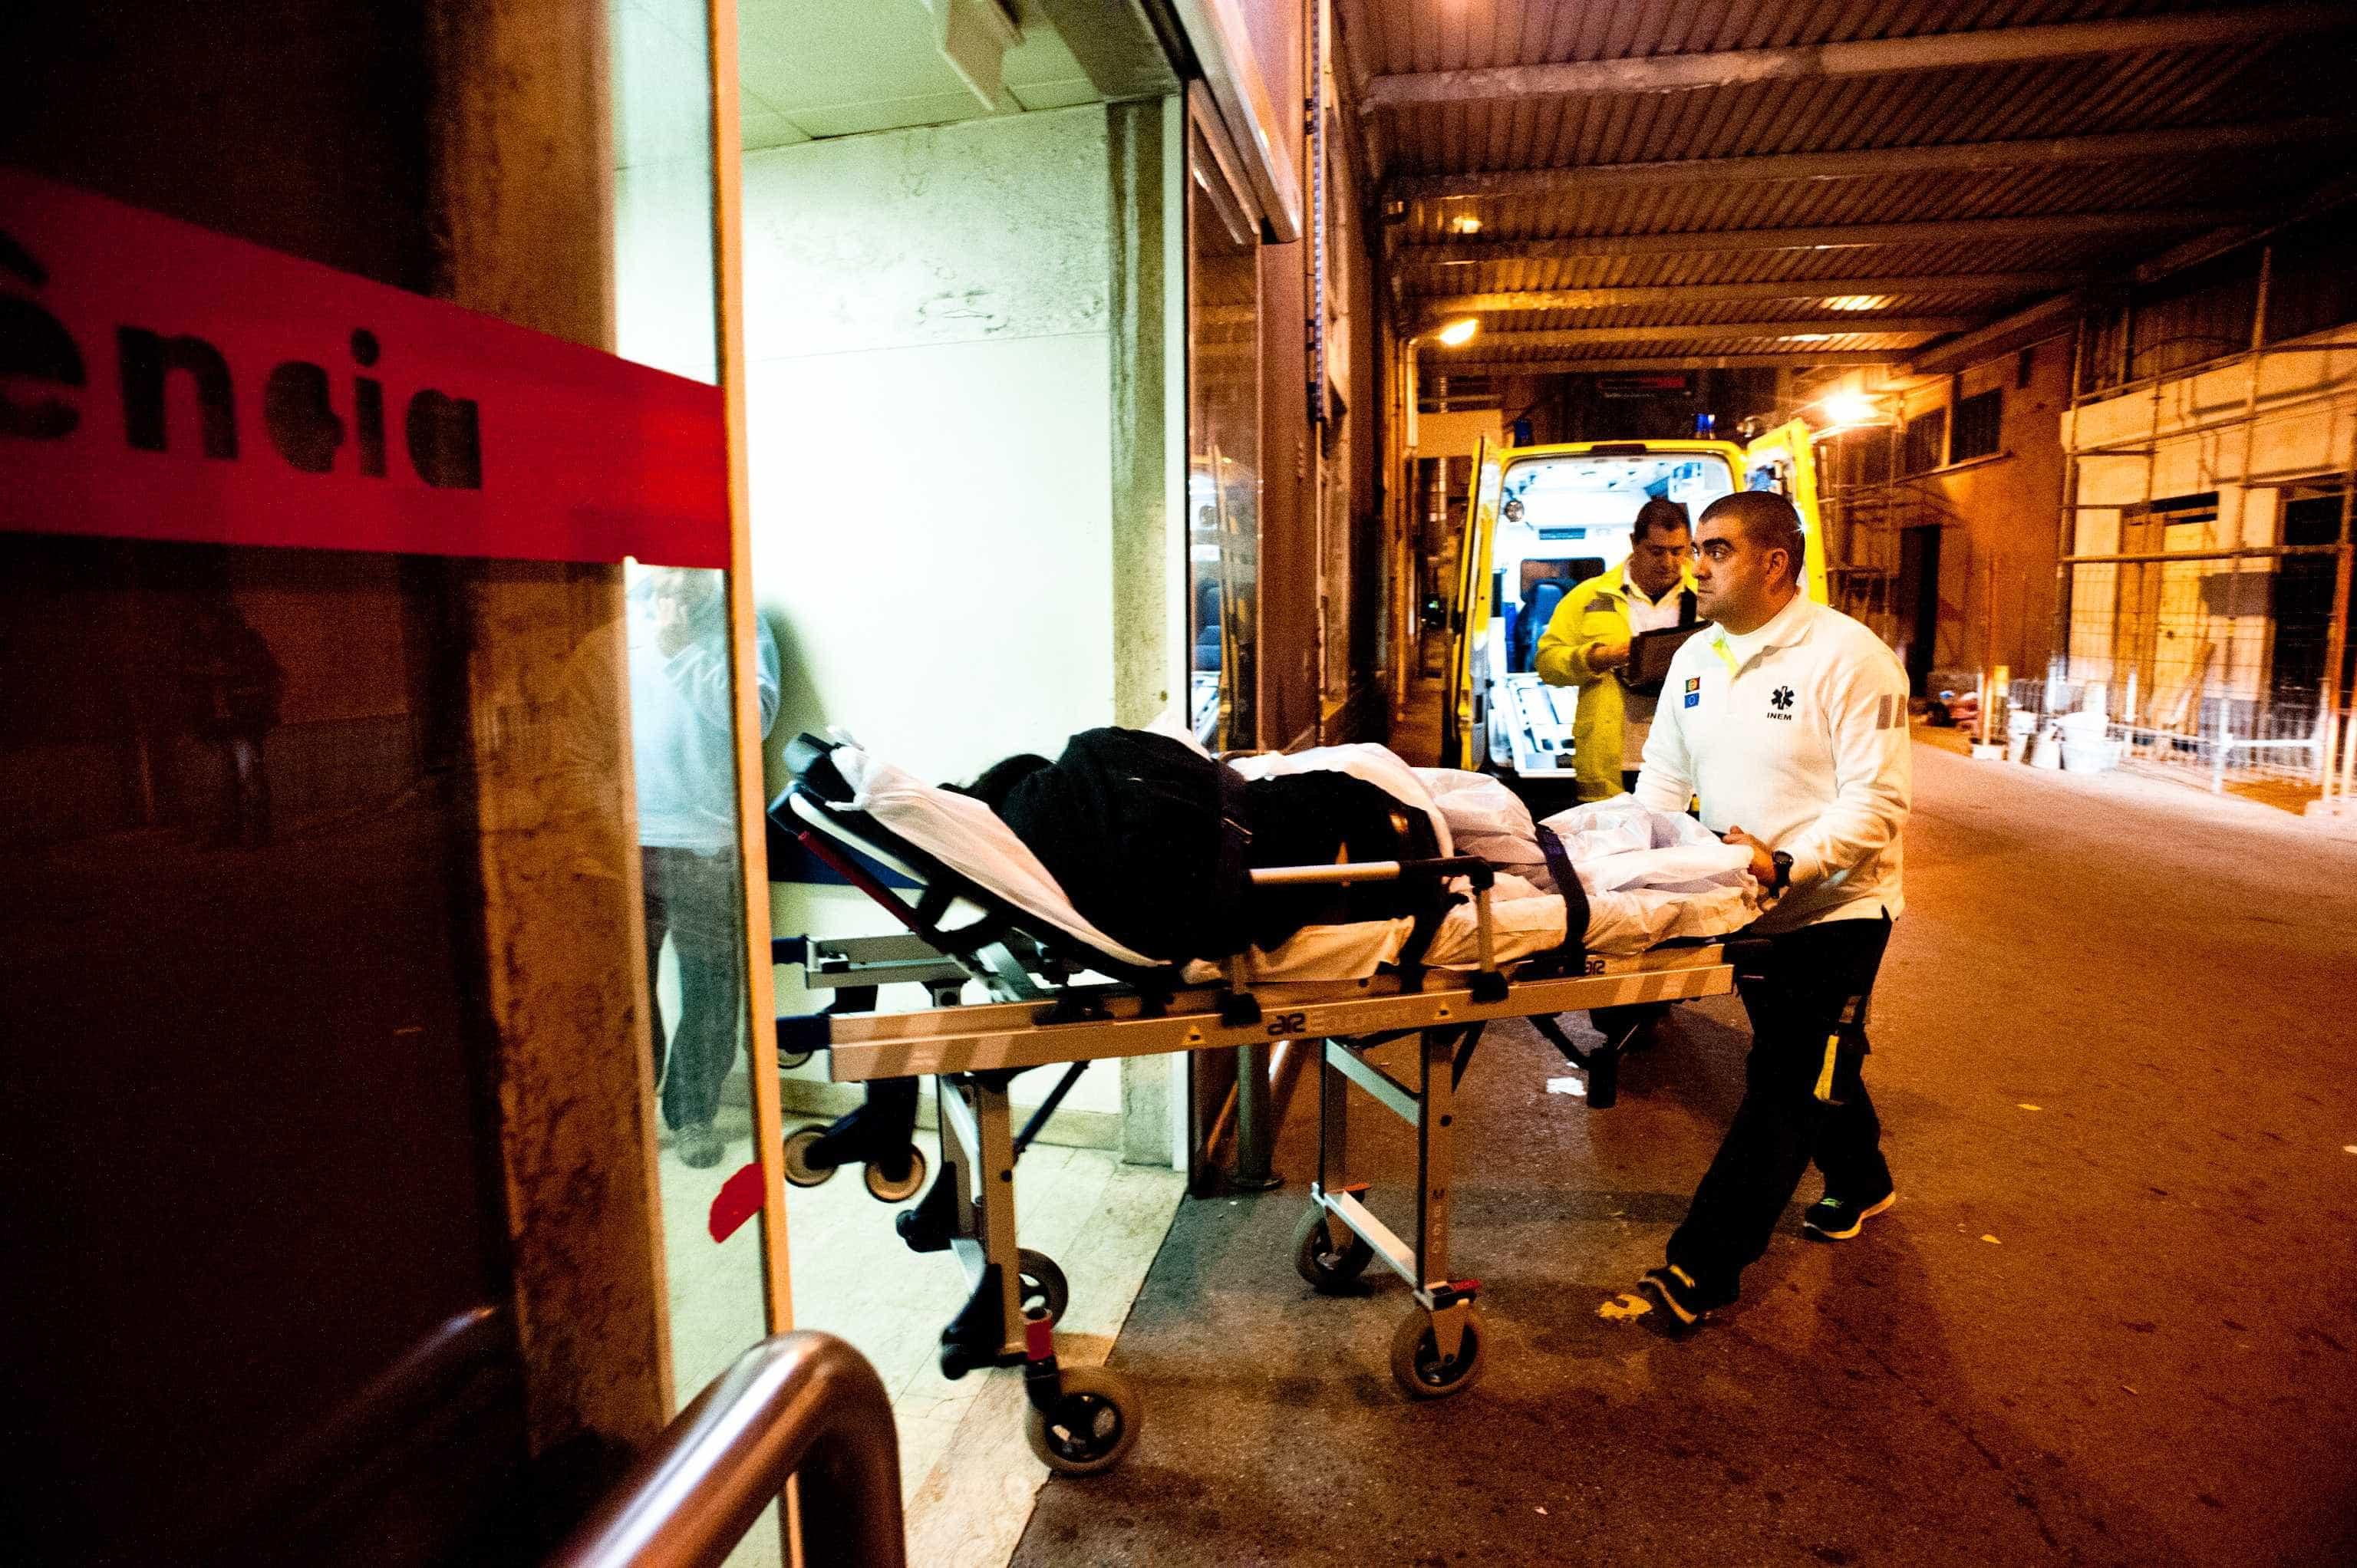 Médico esfaqueado por doente no hospital de Peniche